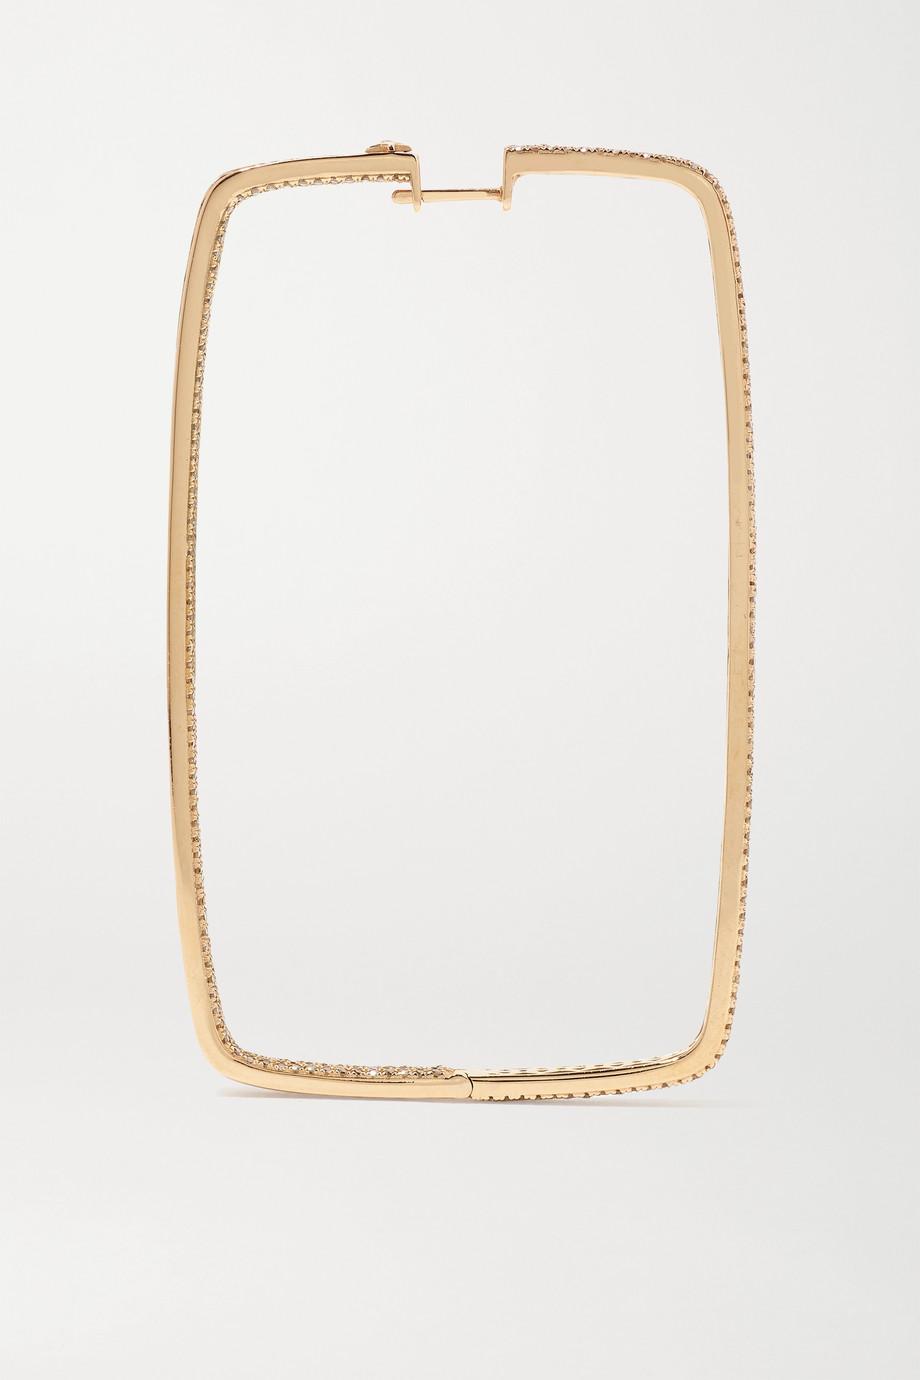 OFIRA Box 18-karat rose gold diamond hoop earrings